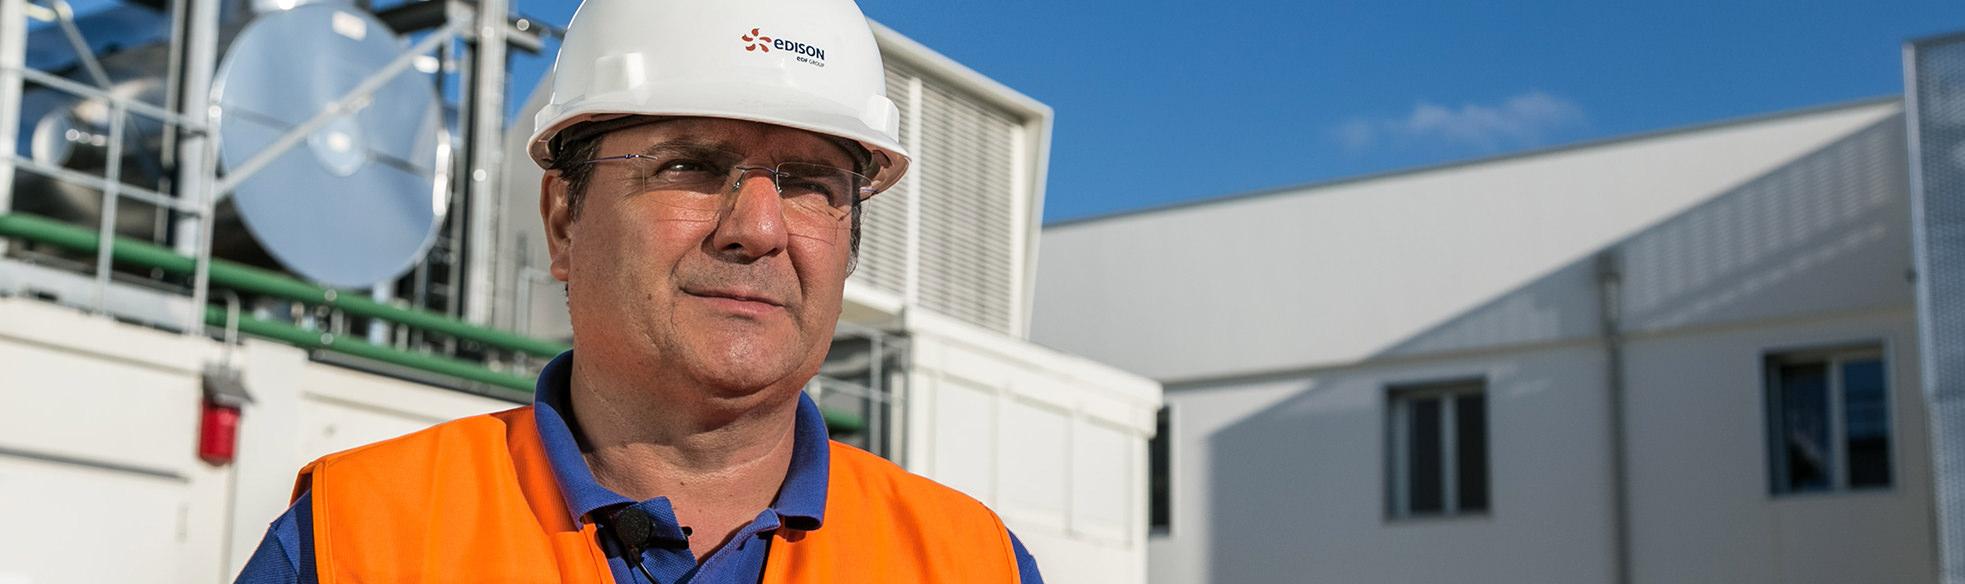 Fabio Bussini, Responsabile Operation&Maintenance